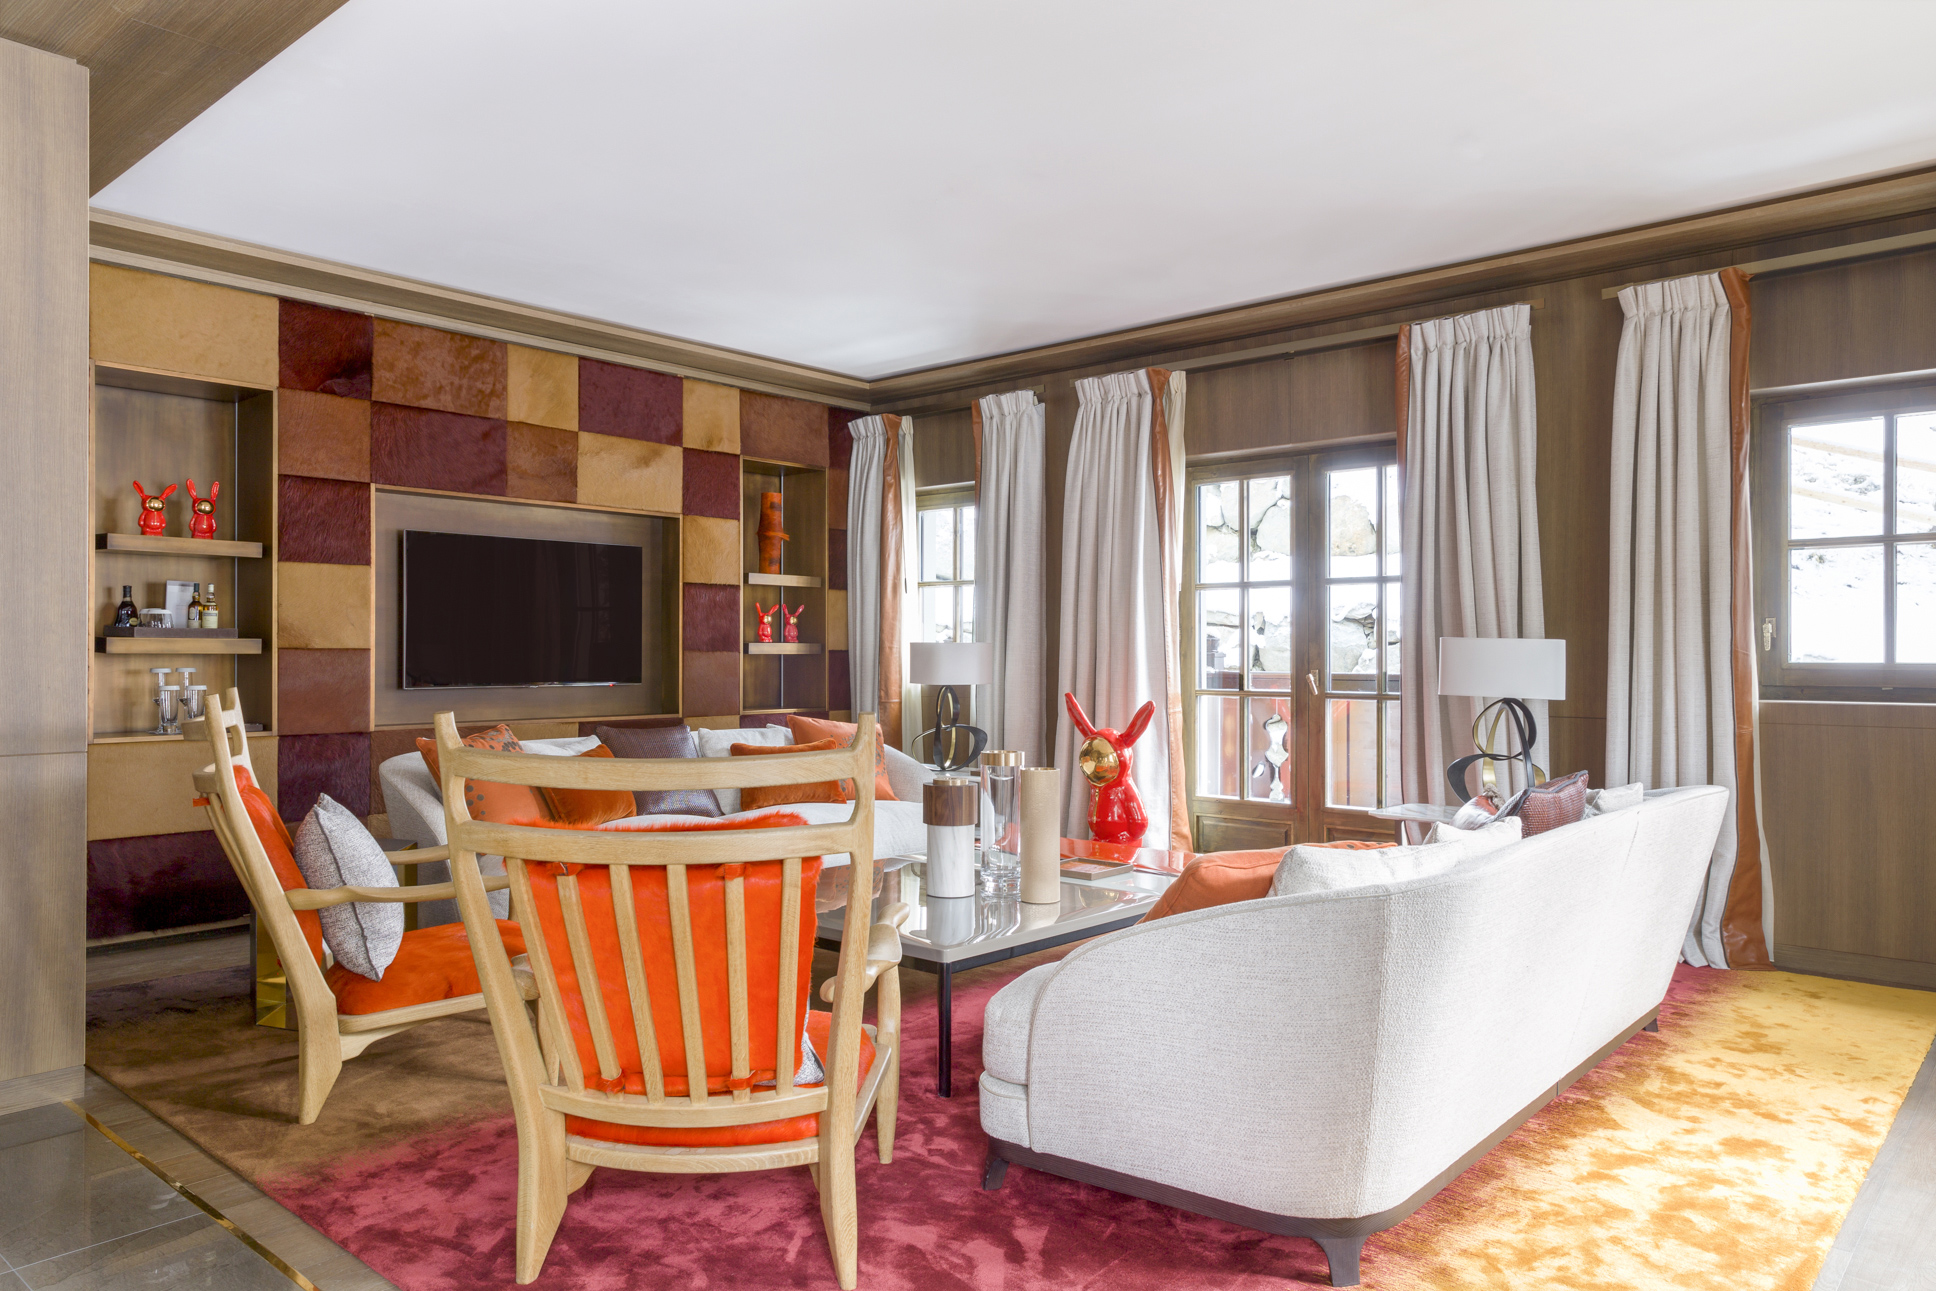 25-le-chalet-salon-le-chalet-living-room-s-julliard.jpg